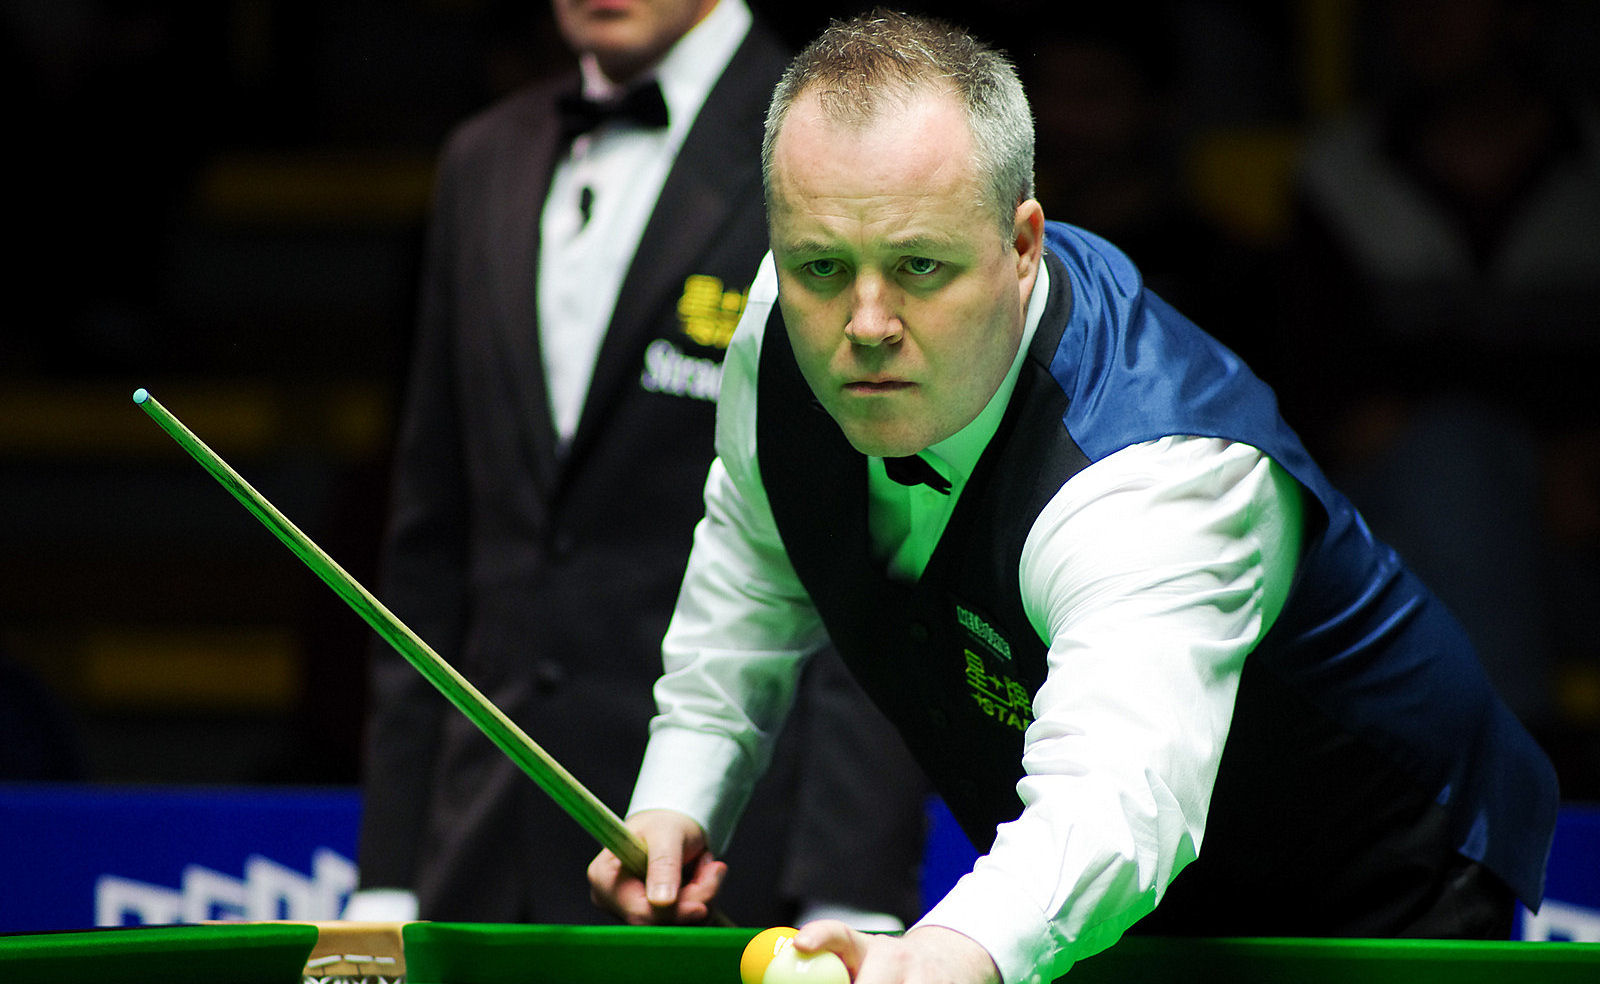 Cvadruplul campion mondial, John Higgins îl va înfrunta pe Ken Doherty, la data de 4 martie, la Cluj-Napoca